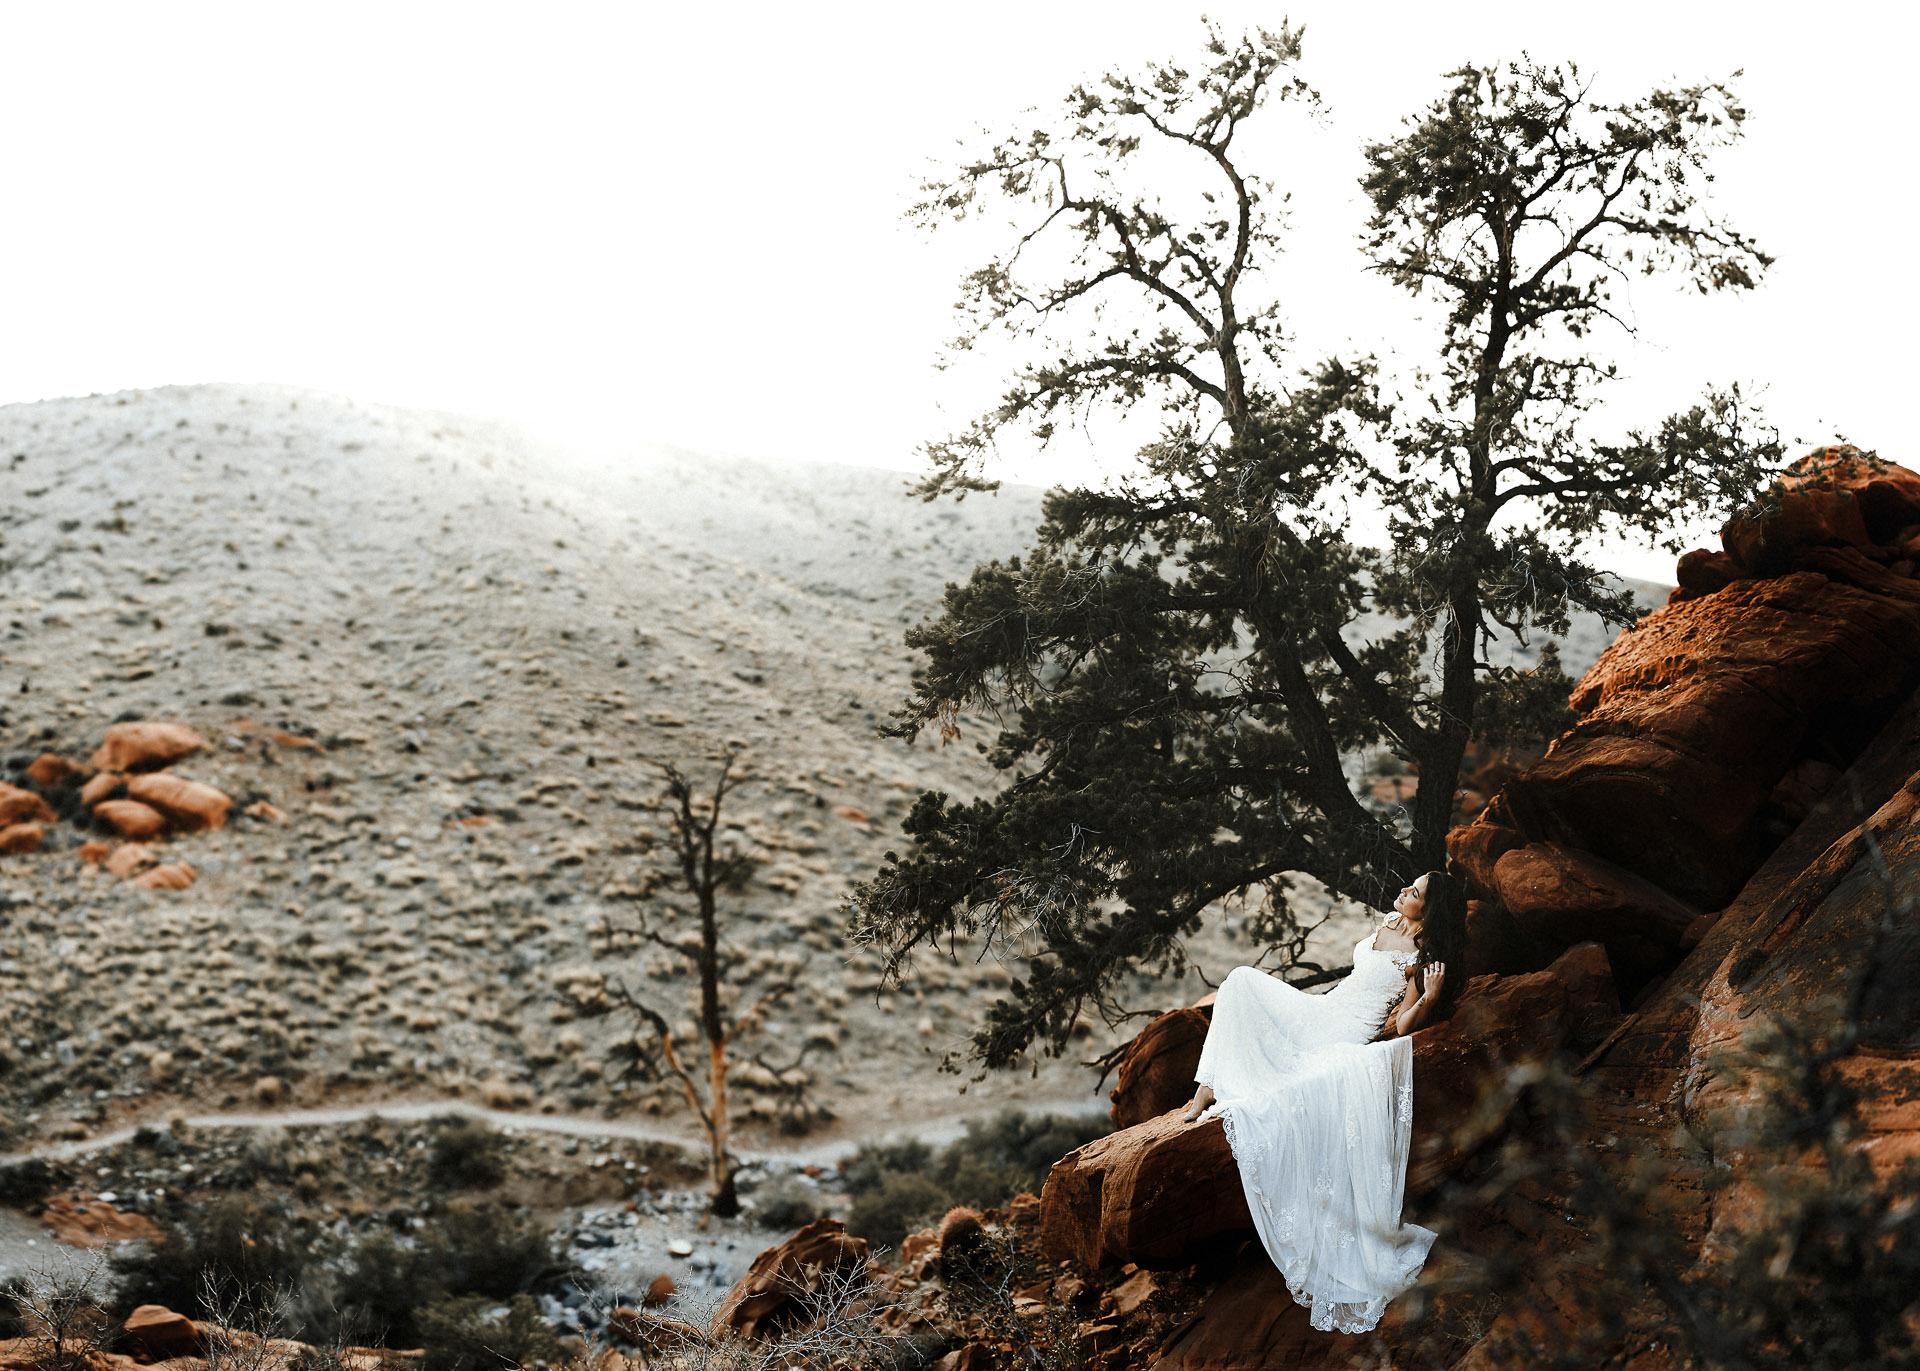 Twisted-Oaks-Studio-wppi-leica-red-rock-canyon-19.jpg